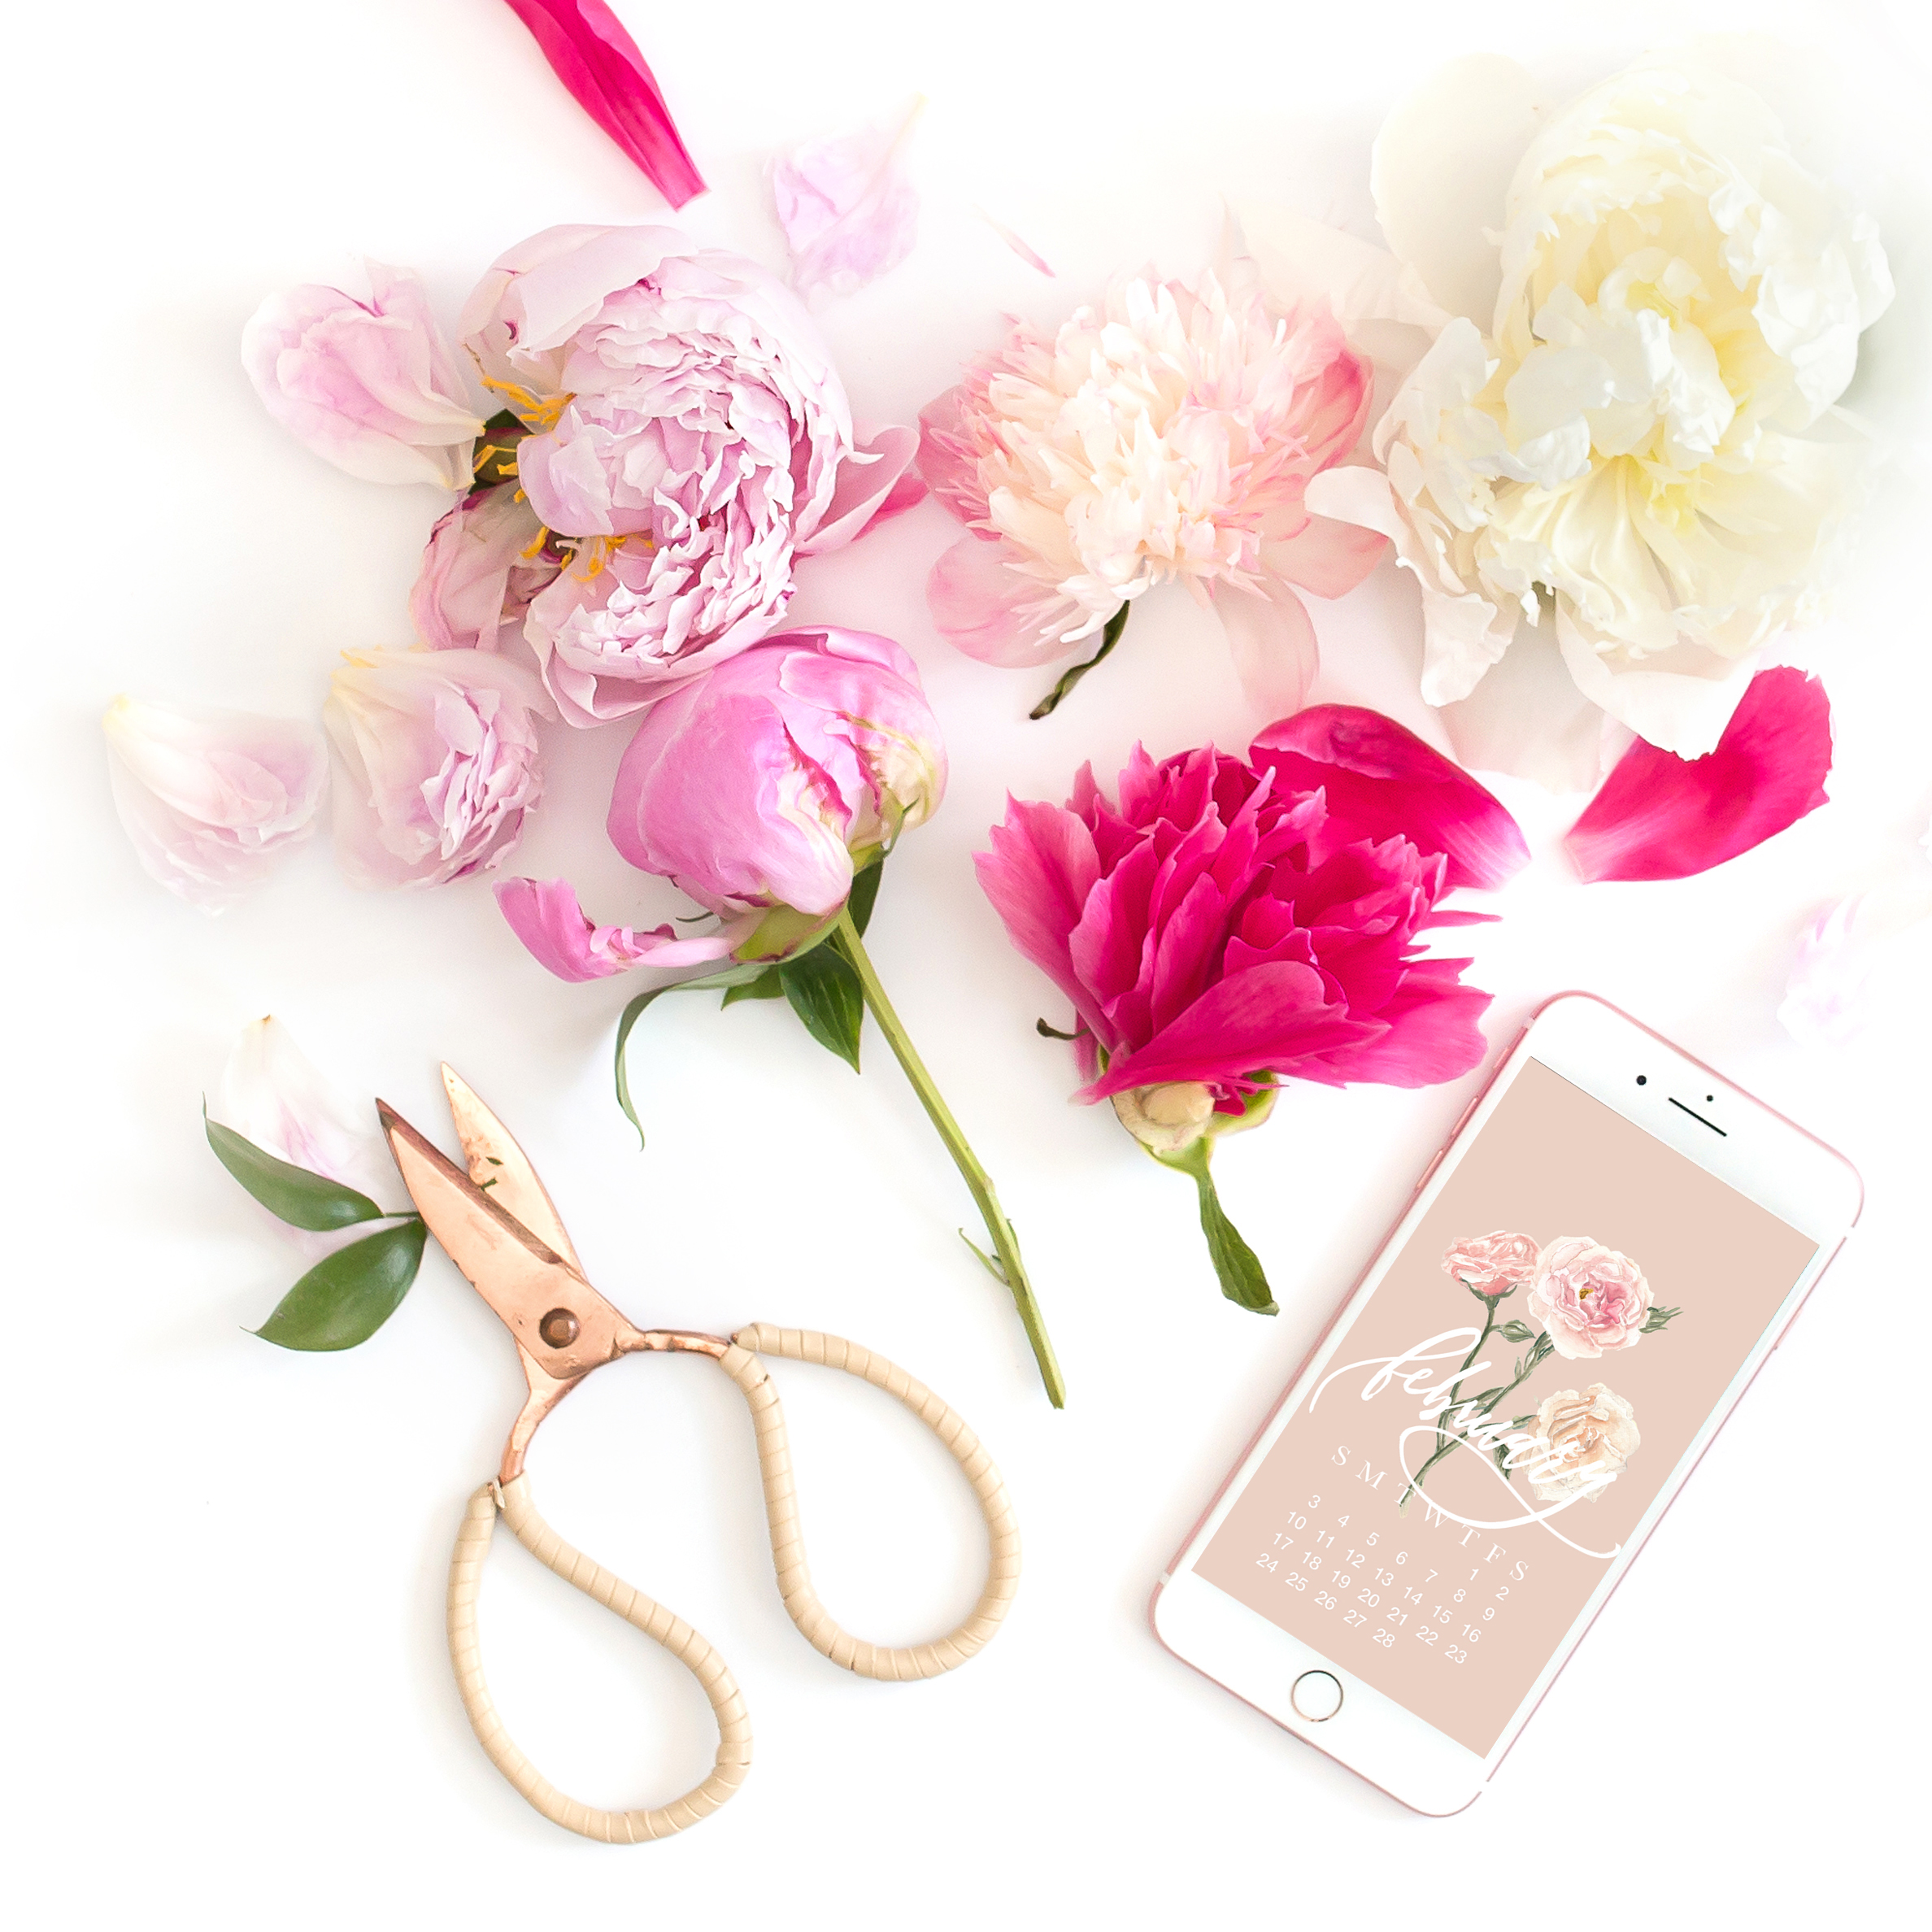 free-february-2019-desktop-and-iphone-calendar-watercolor-roses-brush-calligraphy-muted-pink.jpg